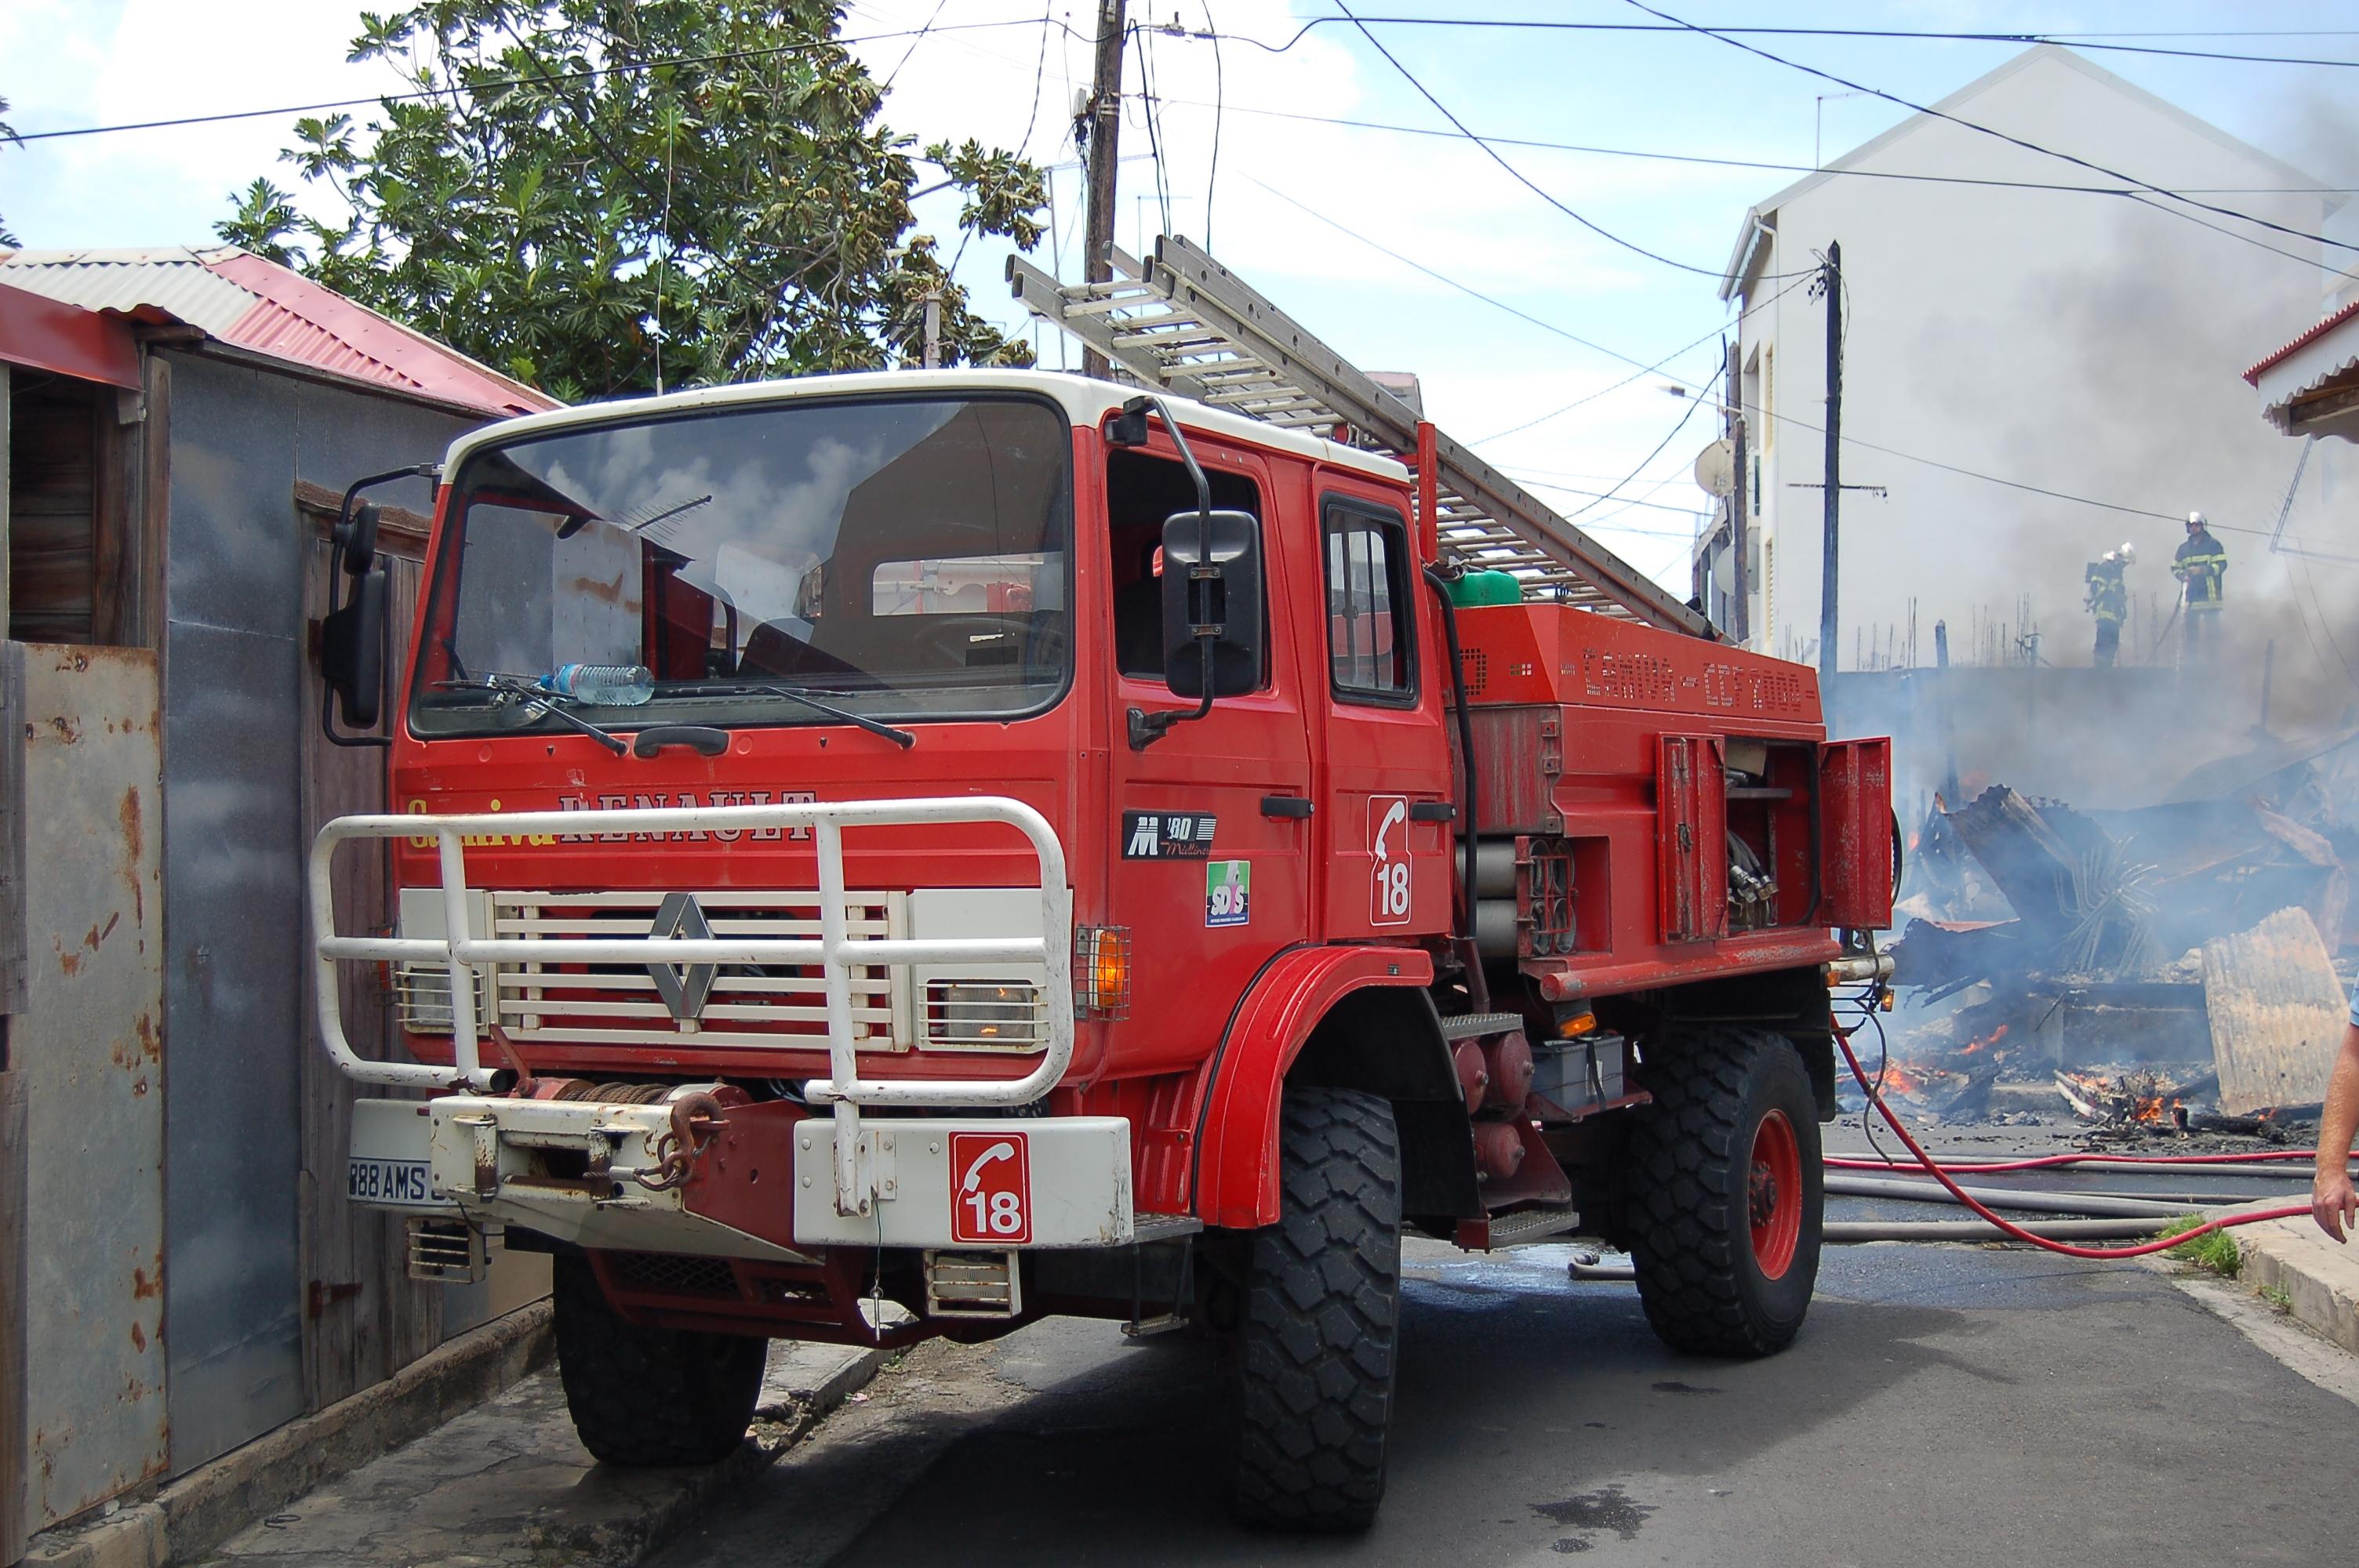 Fichier camion pompier guadeloupe jpg wikip dia - Image camion pompier ...